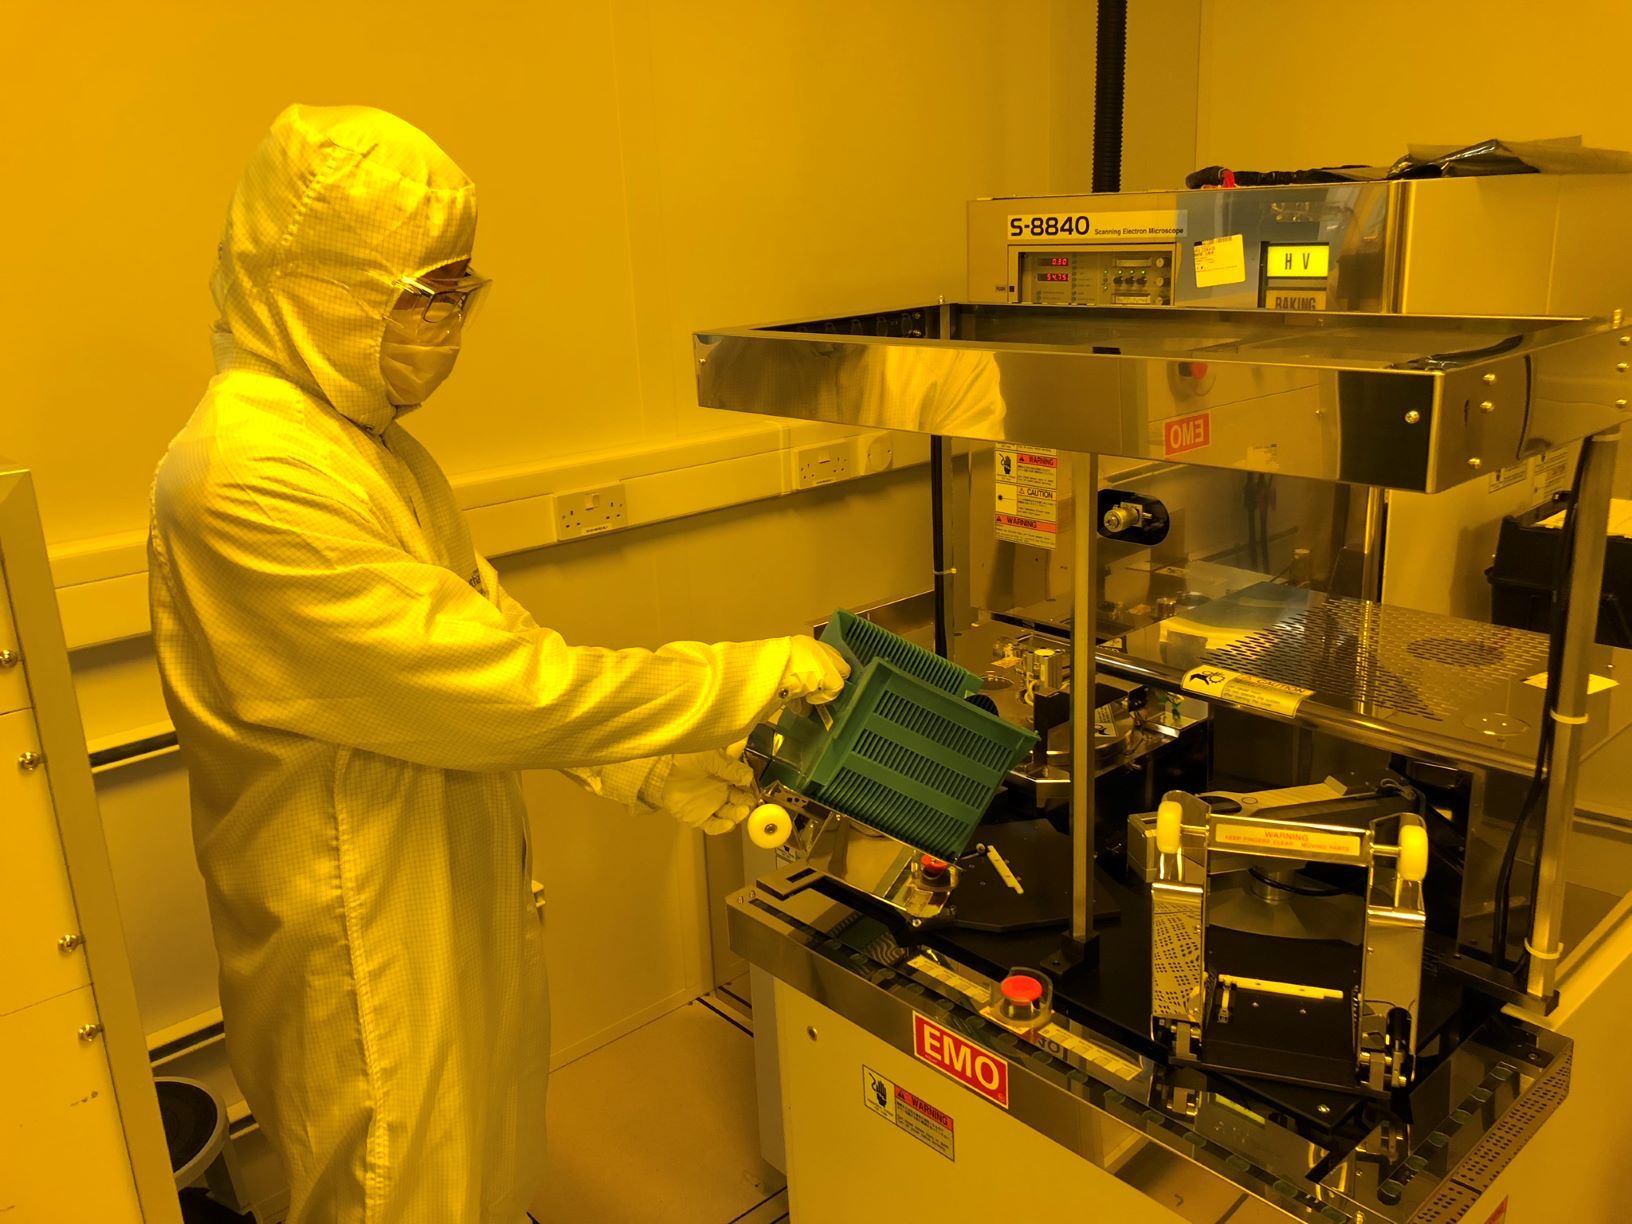 Hitachi S-8840 Critical Dimension Scanning Electron Microscope (CDSEM)